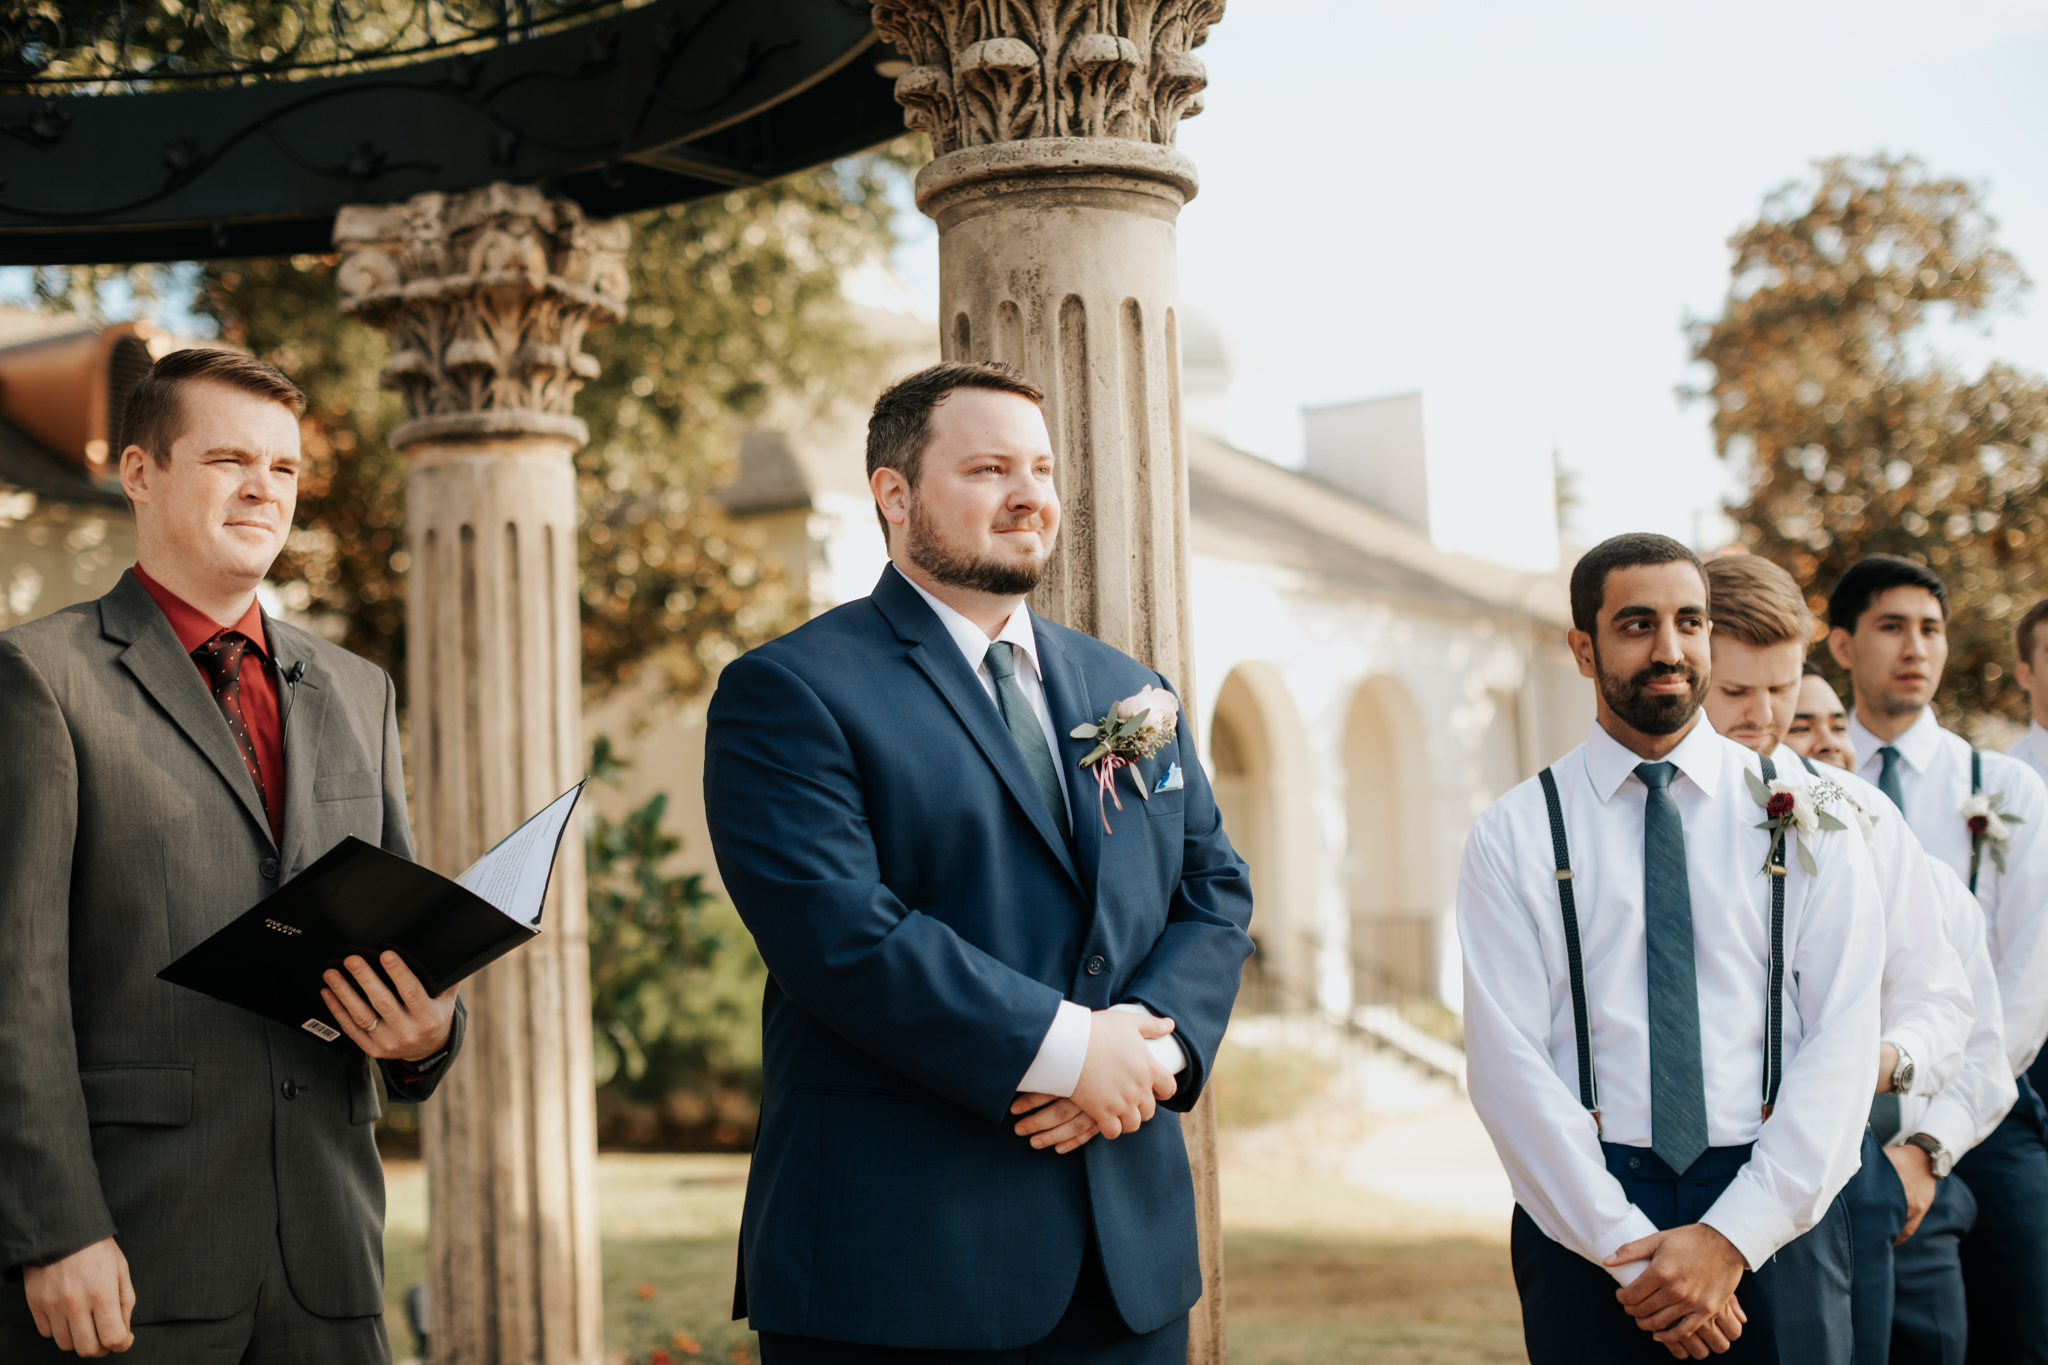 Leah Nicole Photography - Houston Wedding Photographer-Lake Conroe Wedding- Houston Wedding Photographer-28.jpg